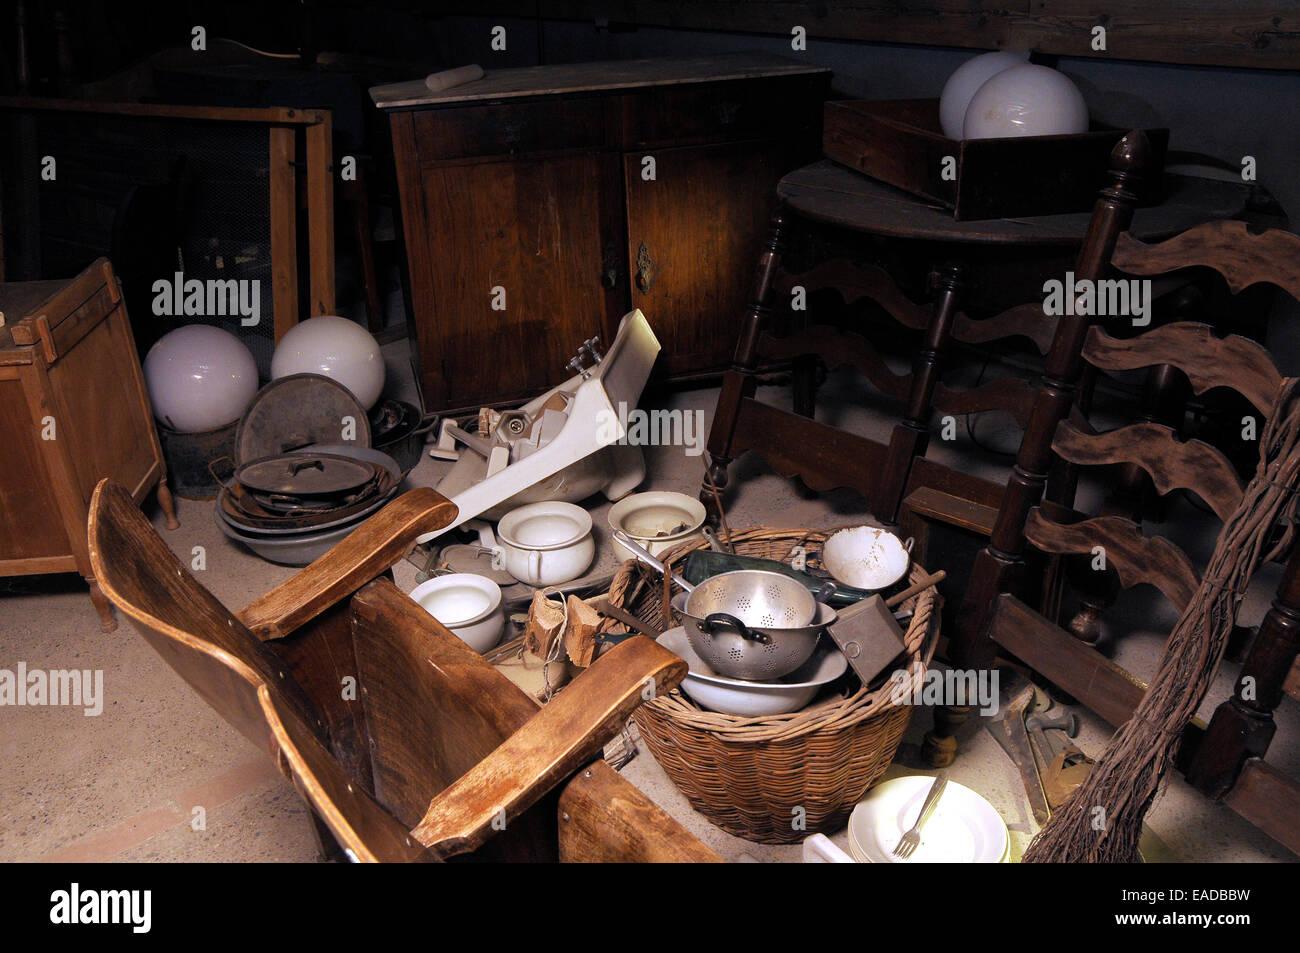 garret, old stuff,attic, old things,antic, mansard - Stock Image